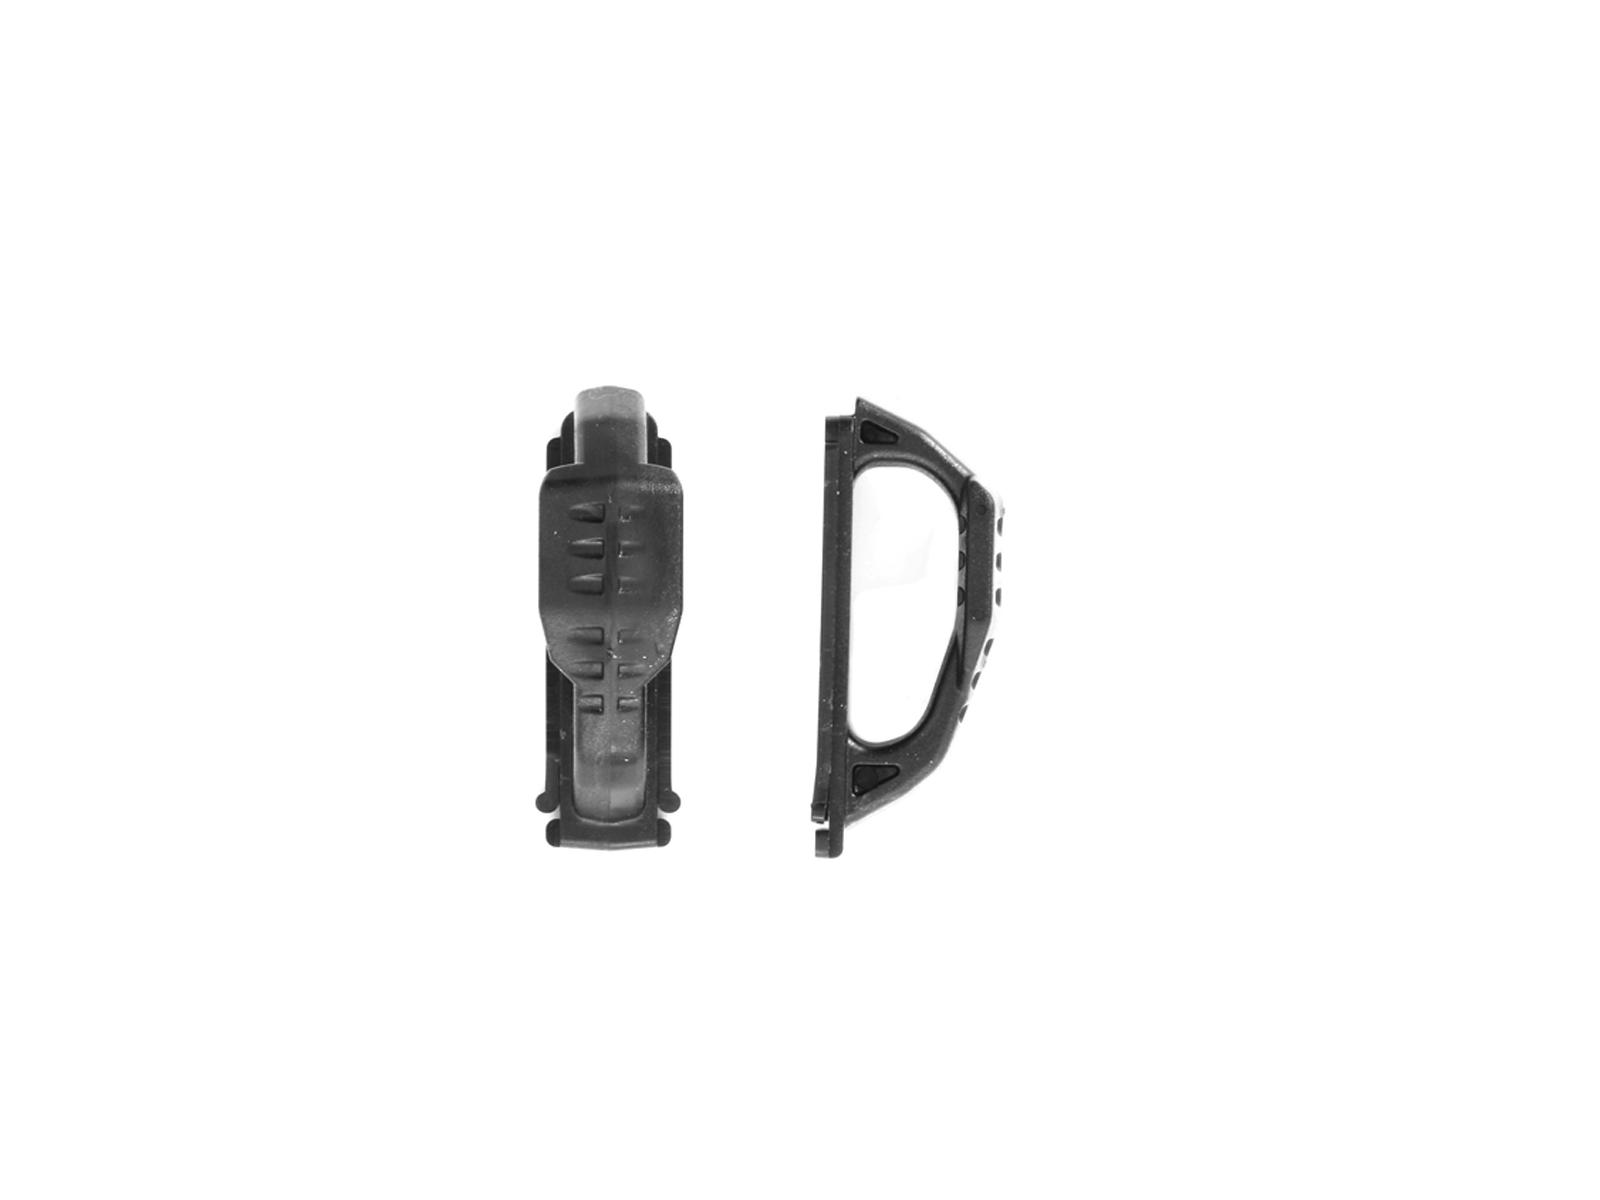 Pull Handles 5 pcs, Black product image